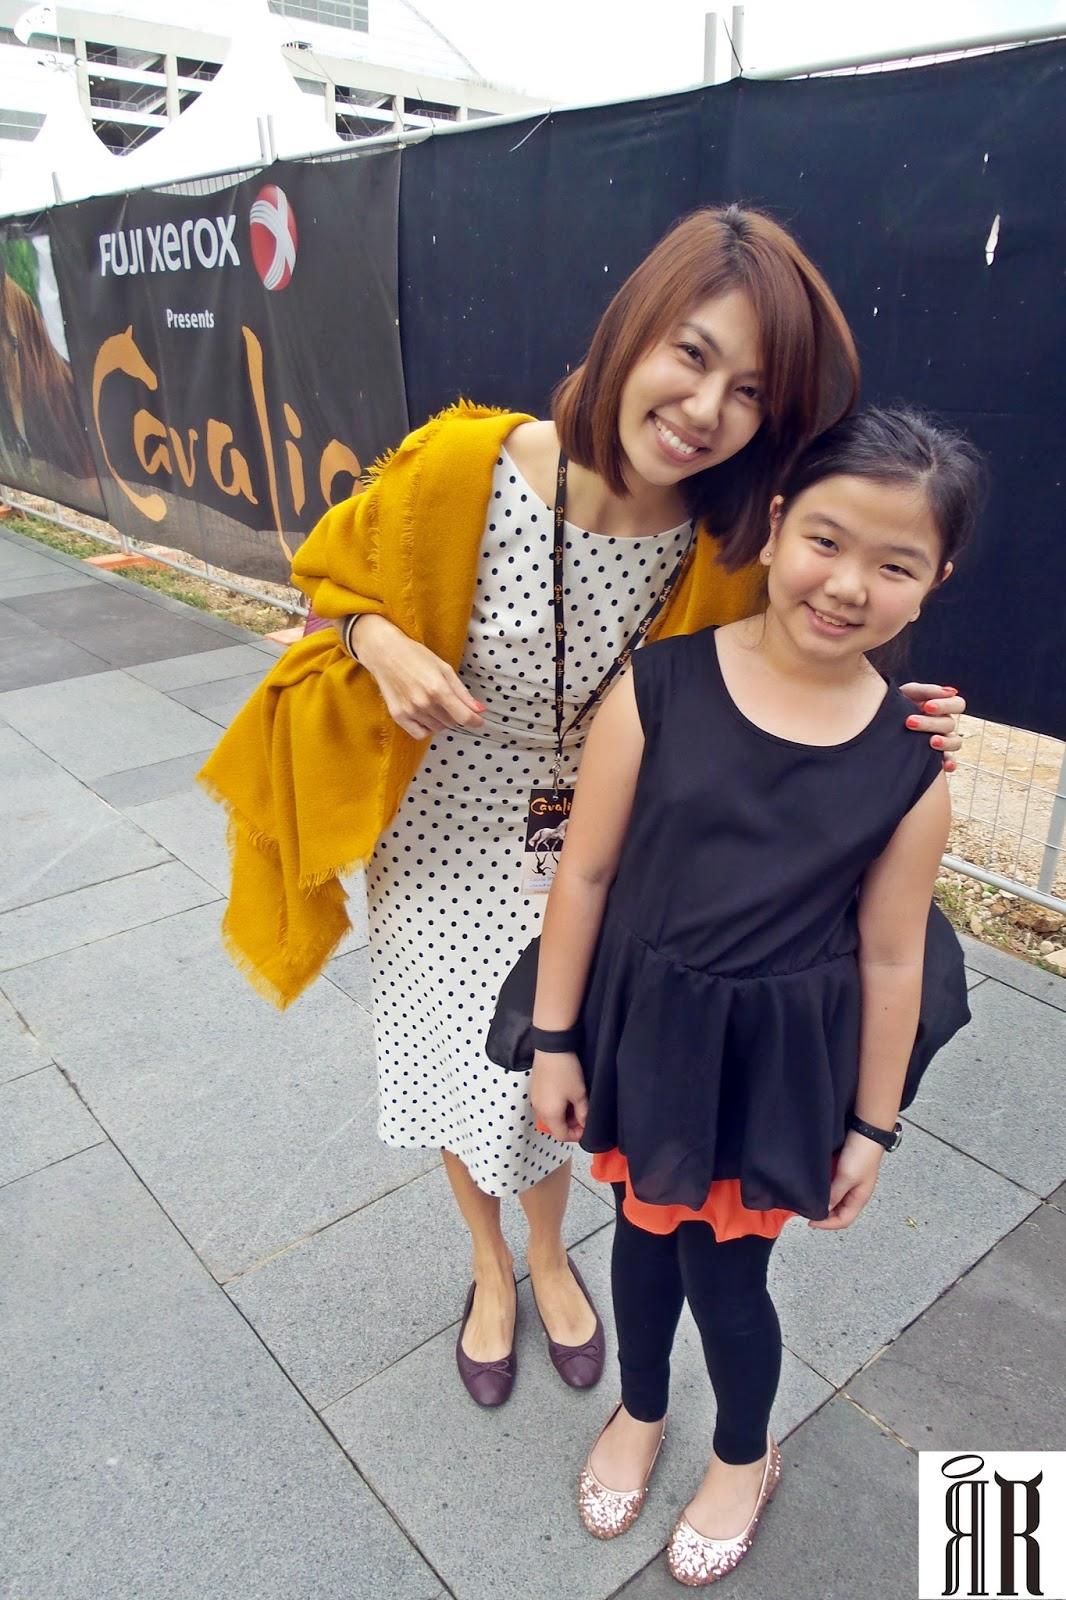 Natasha Poon May Phua